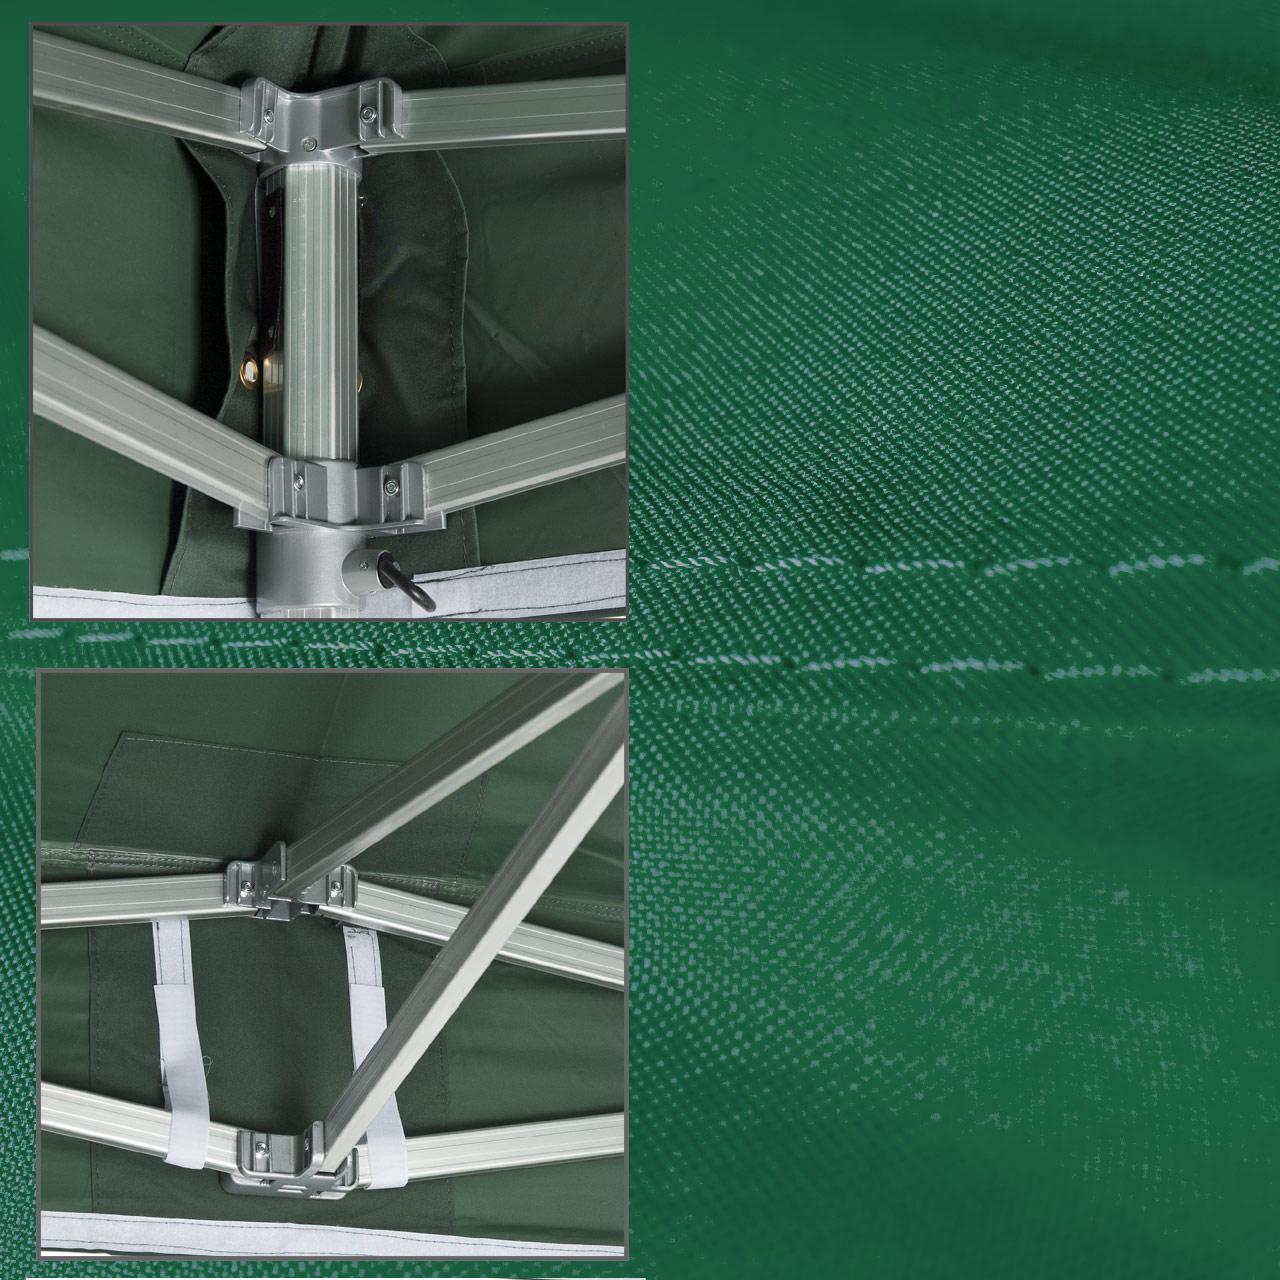 Faltpavillon-Plane-gruen-4558b57b7de3968